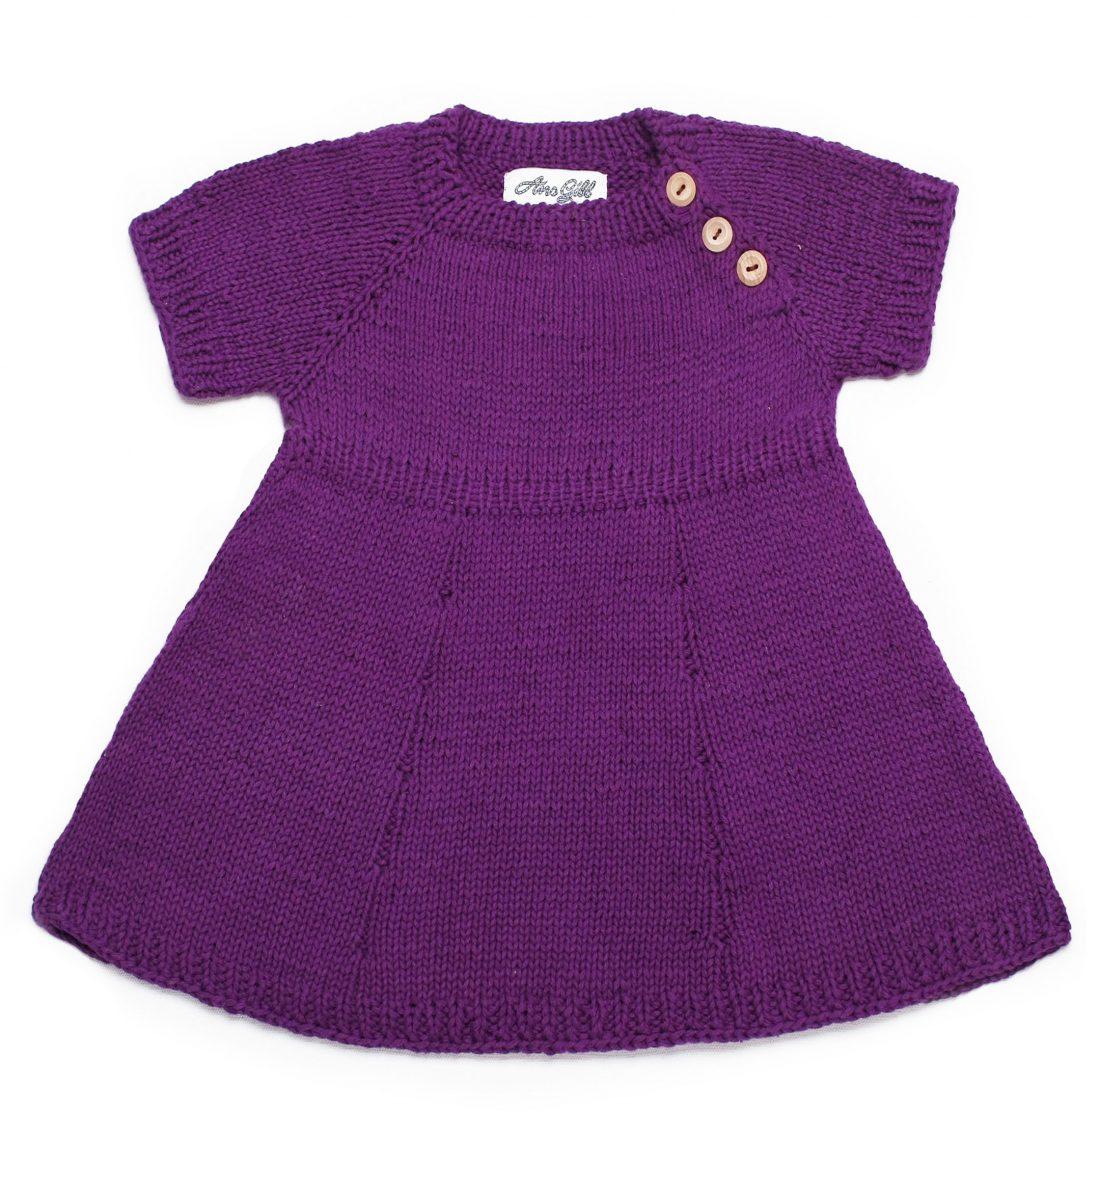 Shortsleeve Cotton Dress 1046 purple